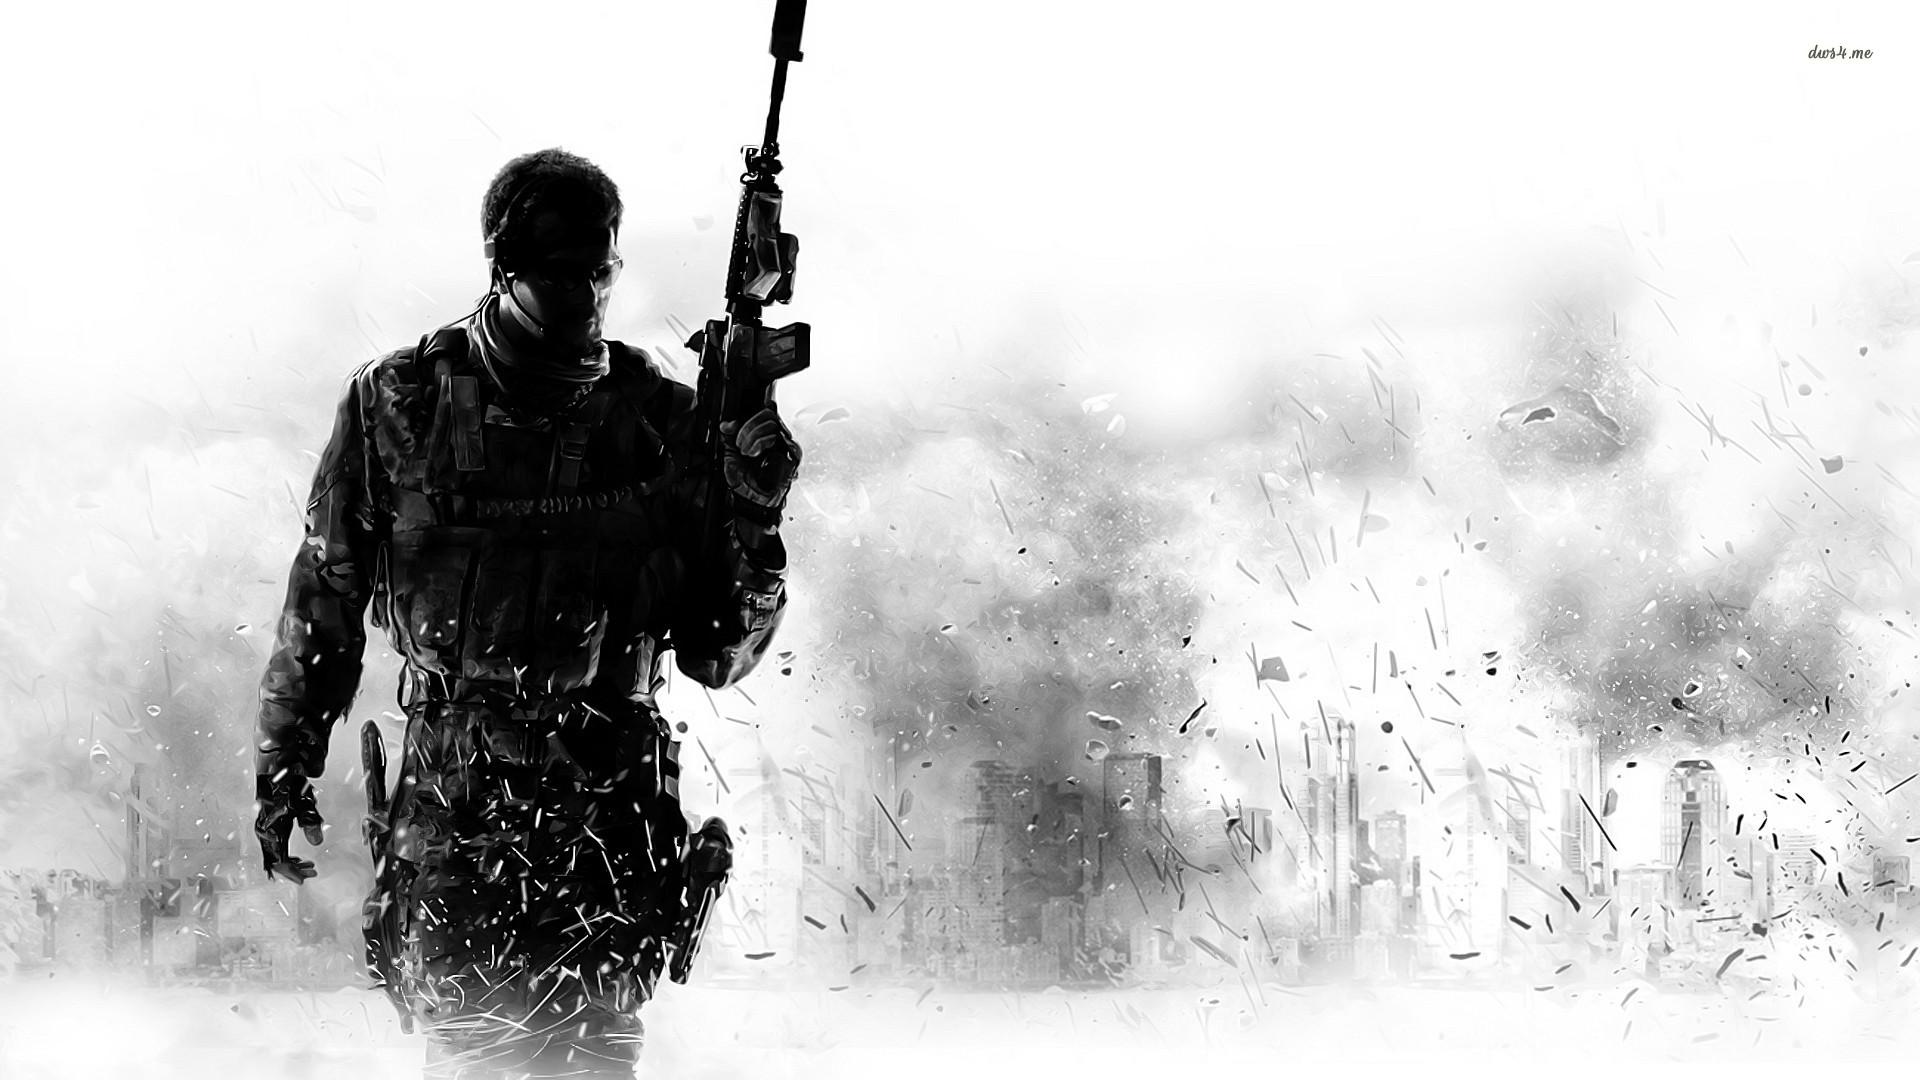 Cod wallpaper - Call of duty warfare wallpaper ...